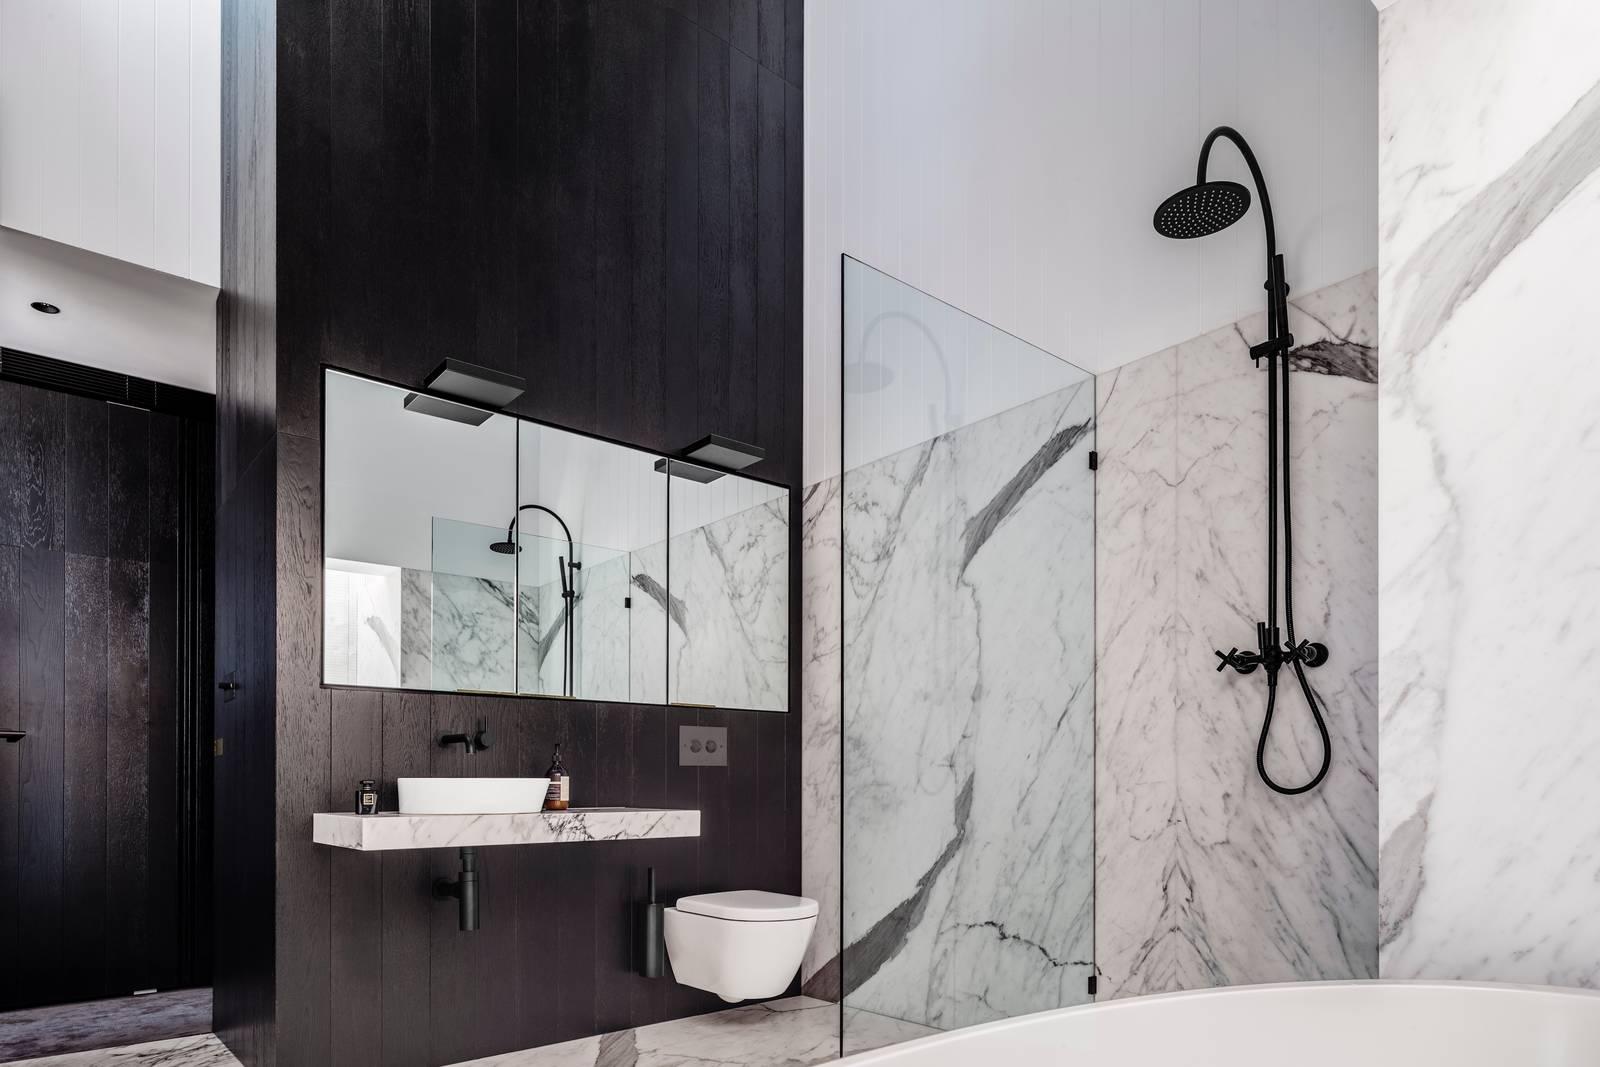 84 Paddington Street, Paddington NSW 2021, Image 7